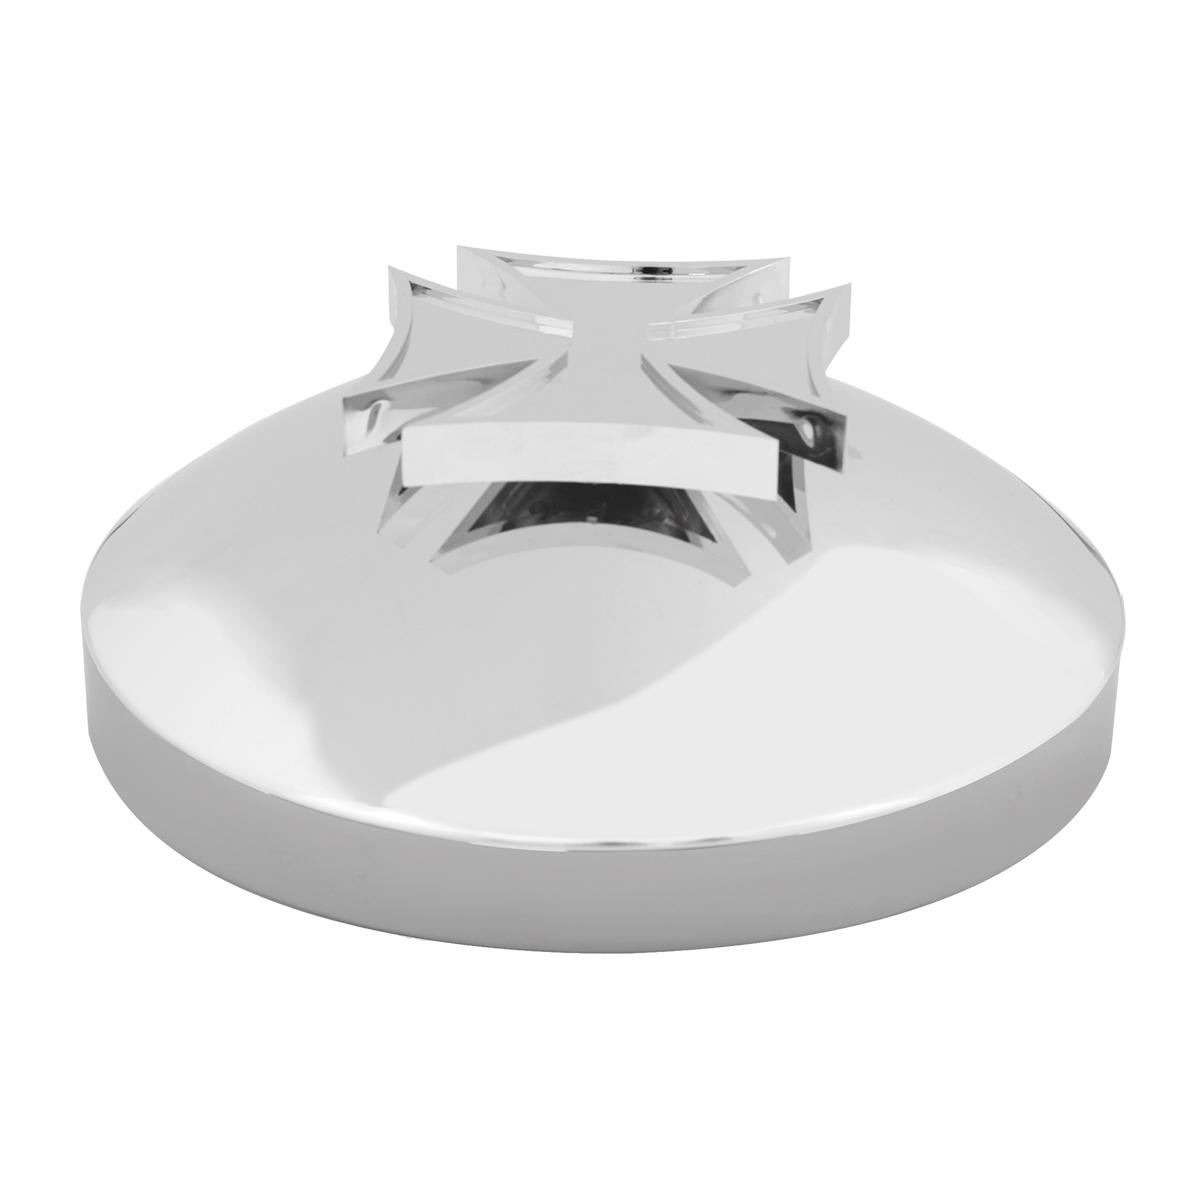 "7 ¼"" Rear Hub Cap with Cross Spinner"